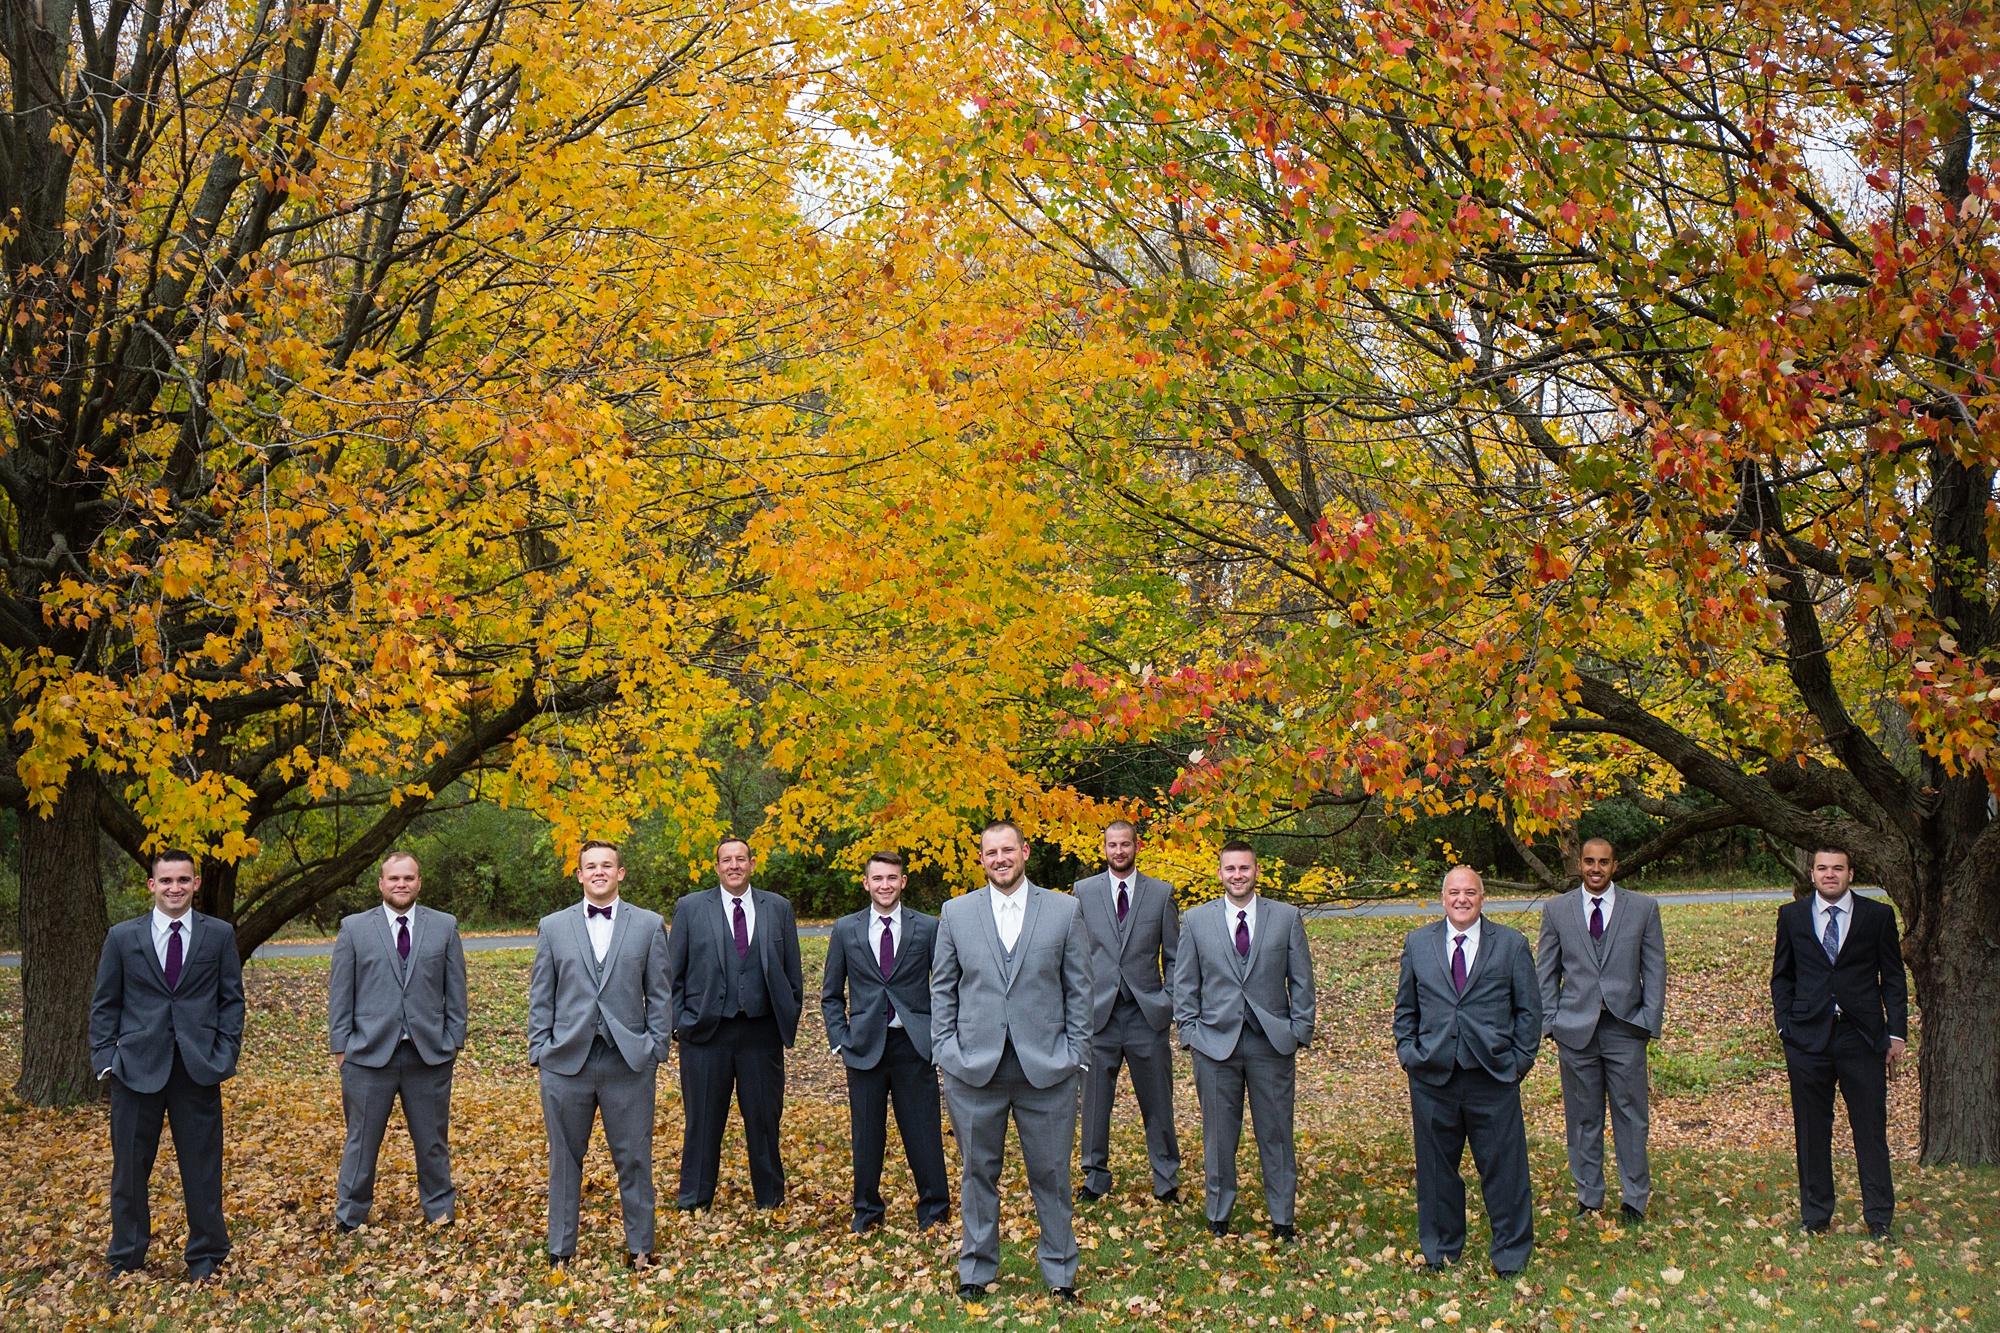 Brandon_Shafer_Photography_Emily_Travis_Kalamazoo_Wedding_Photography_0012.jpg